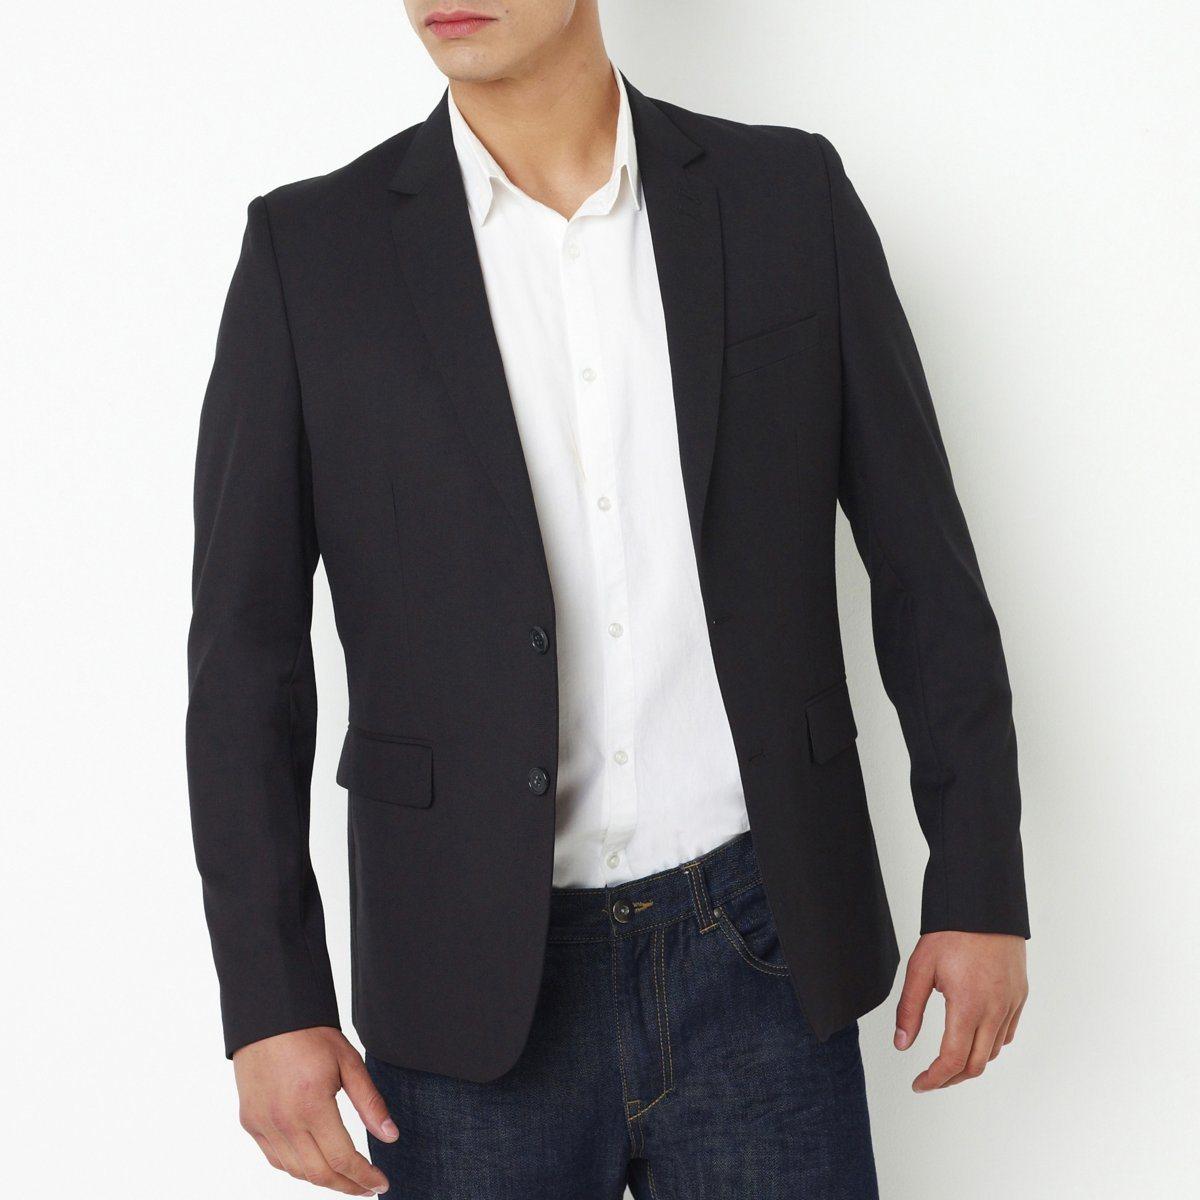 veste blazer homme une veste au bon prix. Black Bedroom Furniture Sets. Home Design Ideas